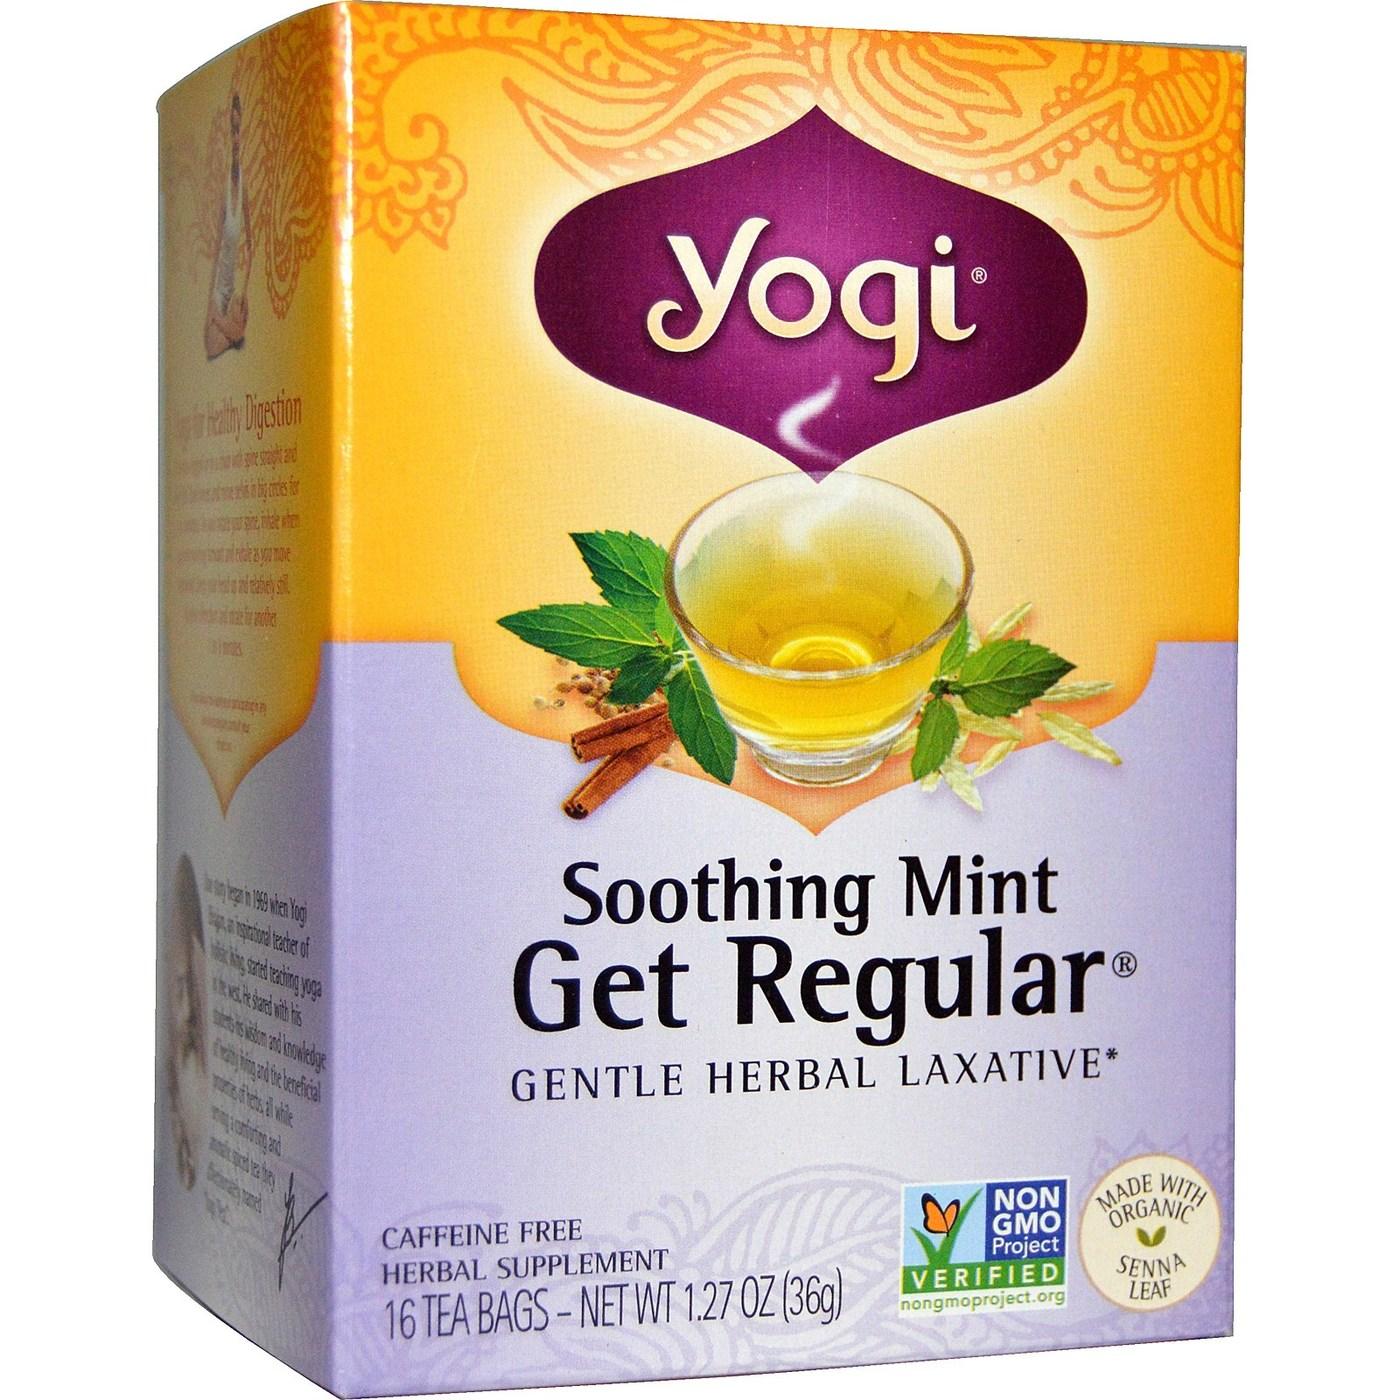 Yogi tea get regular